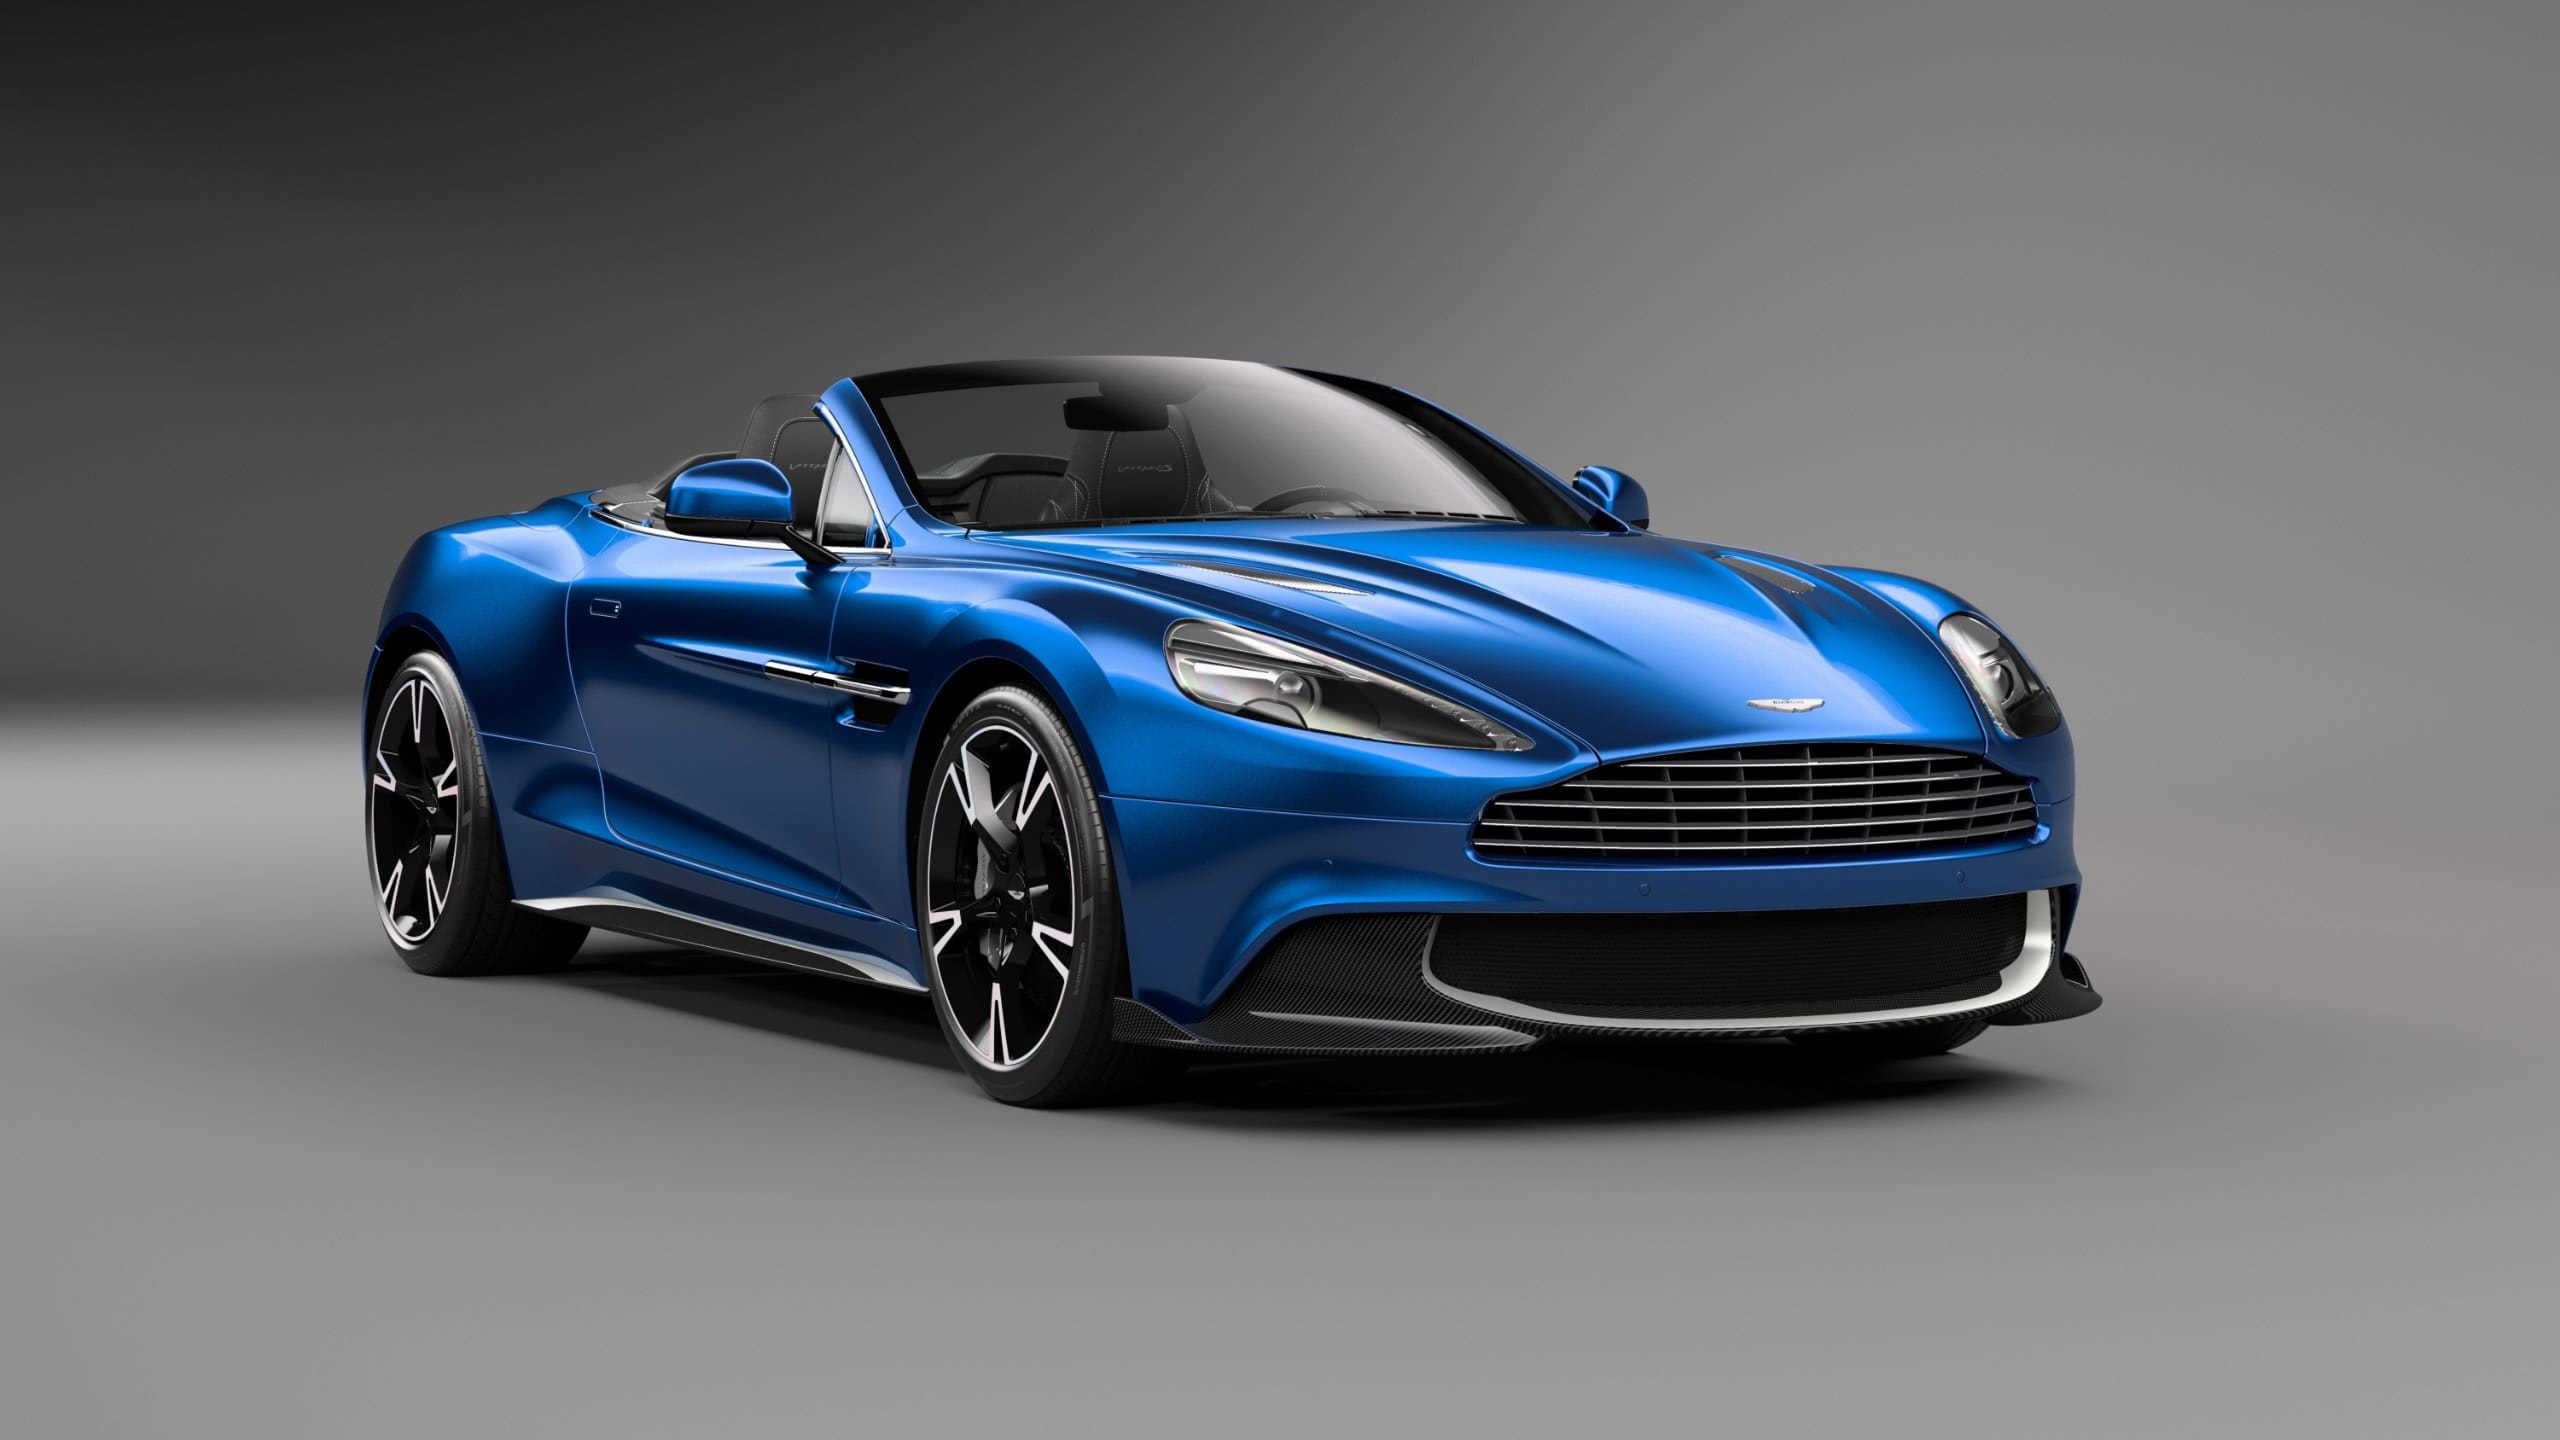 Aston Martin Vanquish S Volante Wqhd 1440p Wallpaper Pixelz Cc